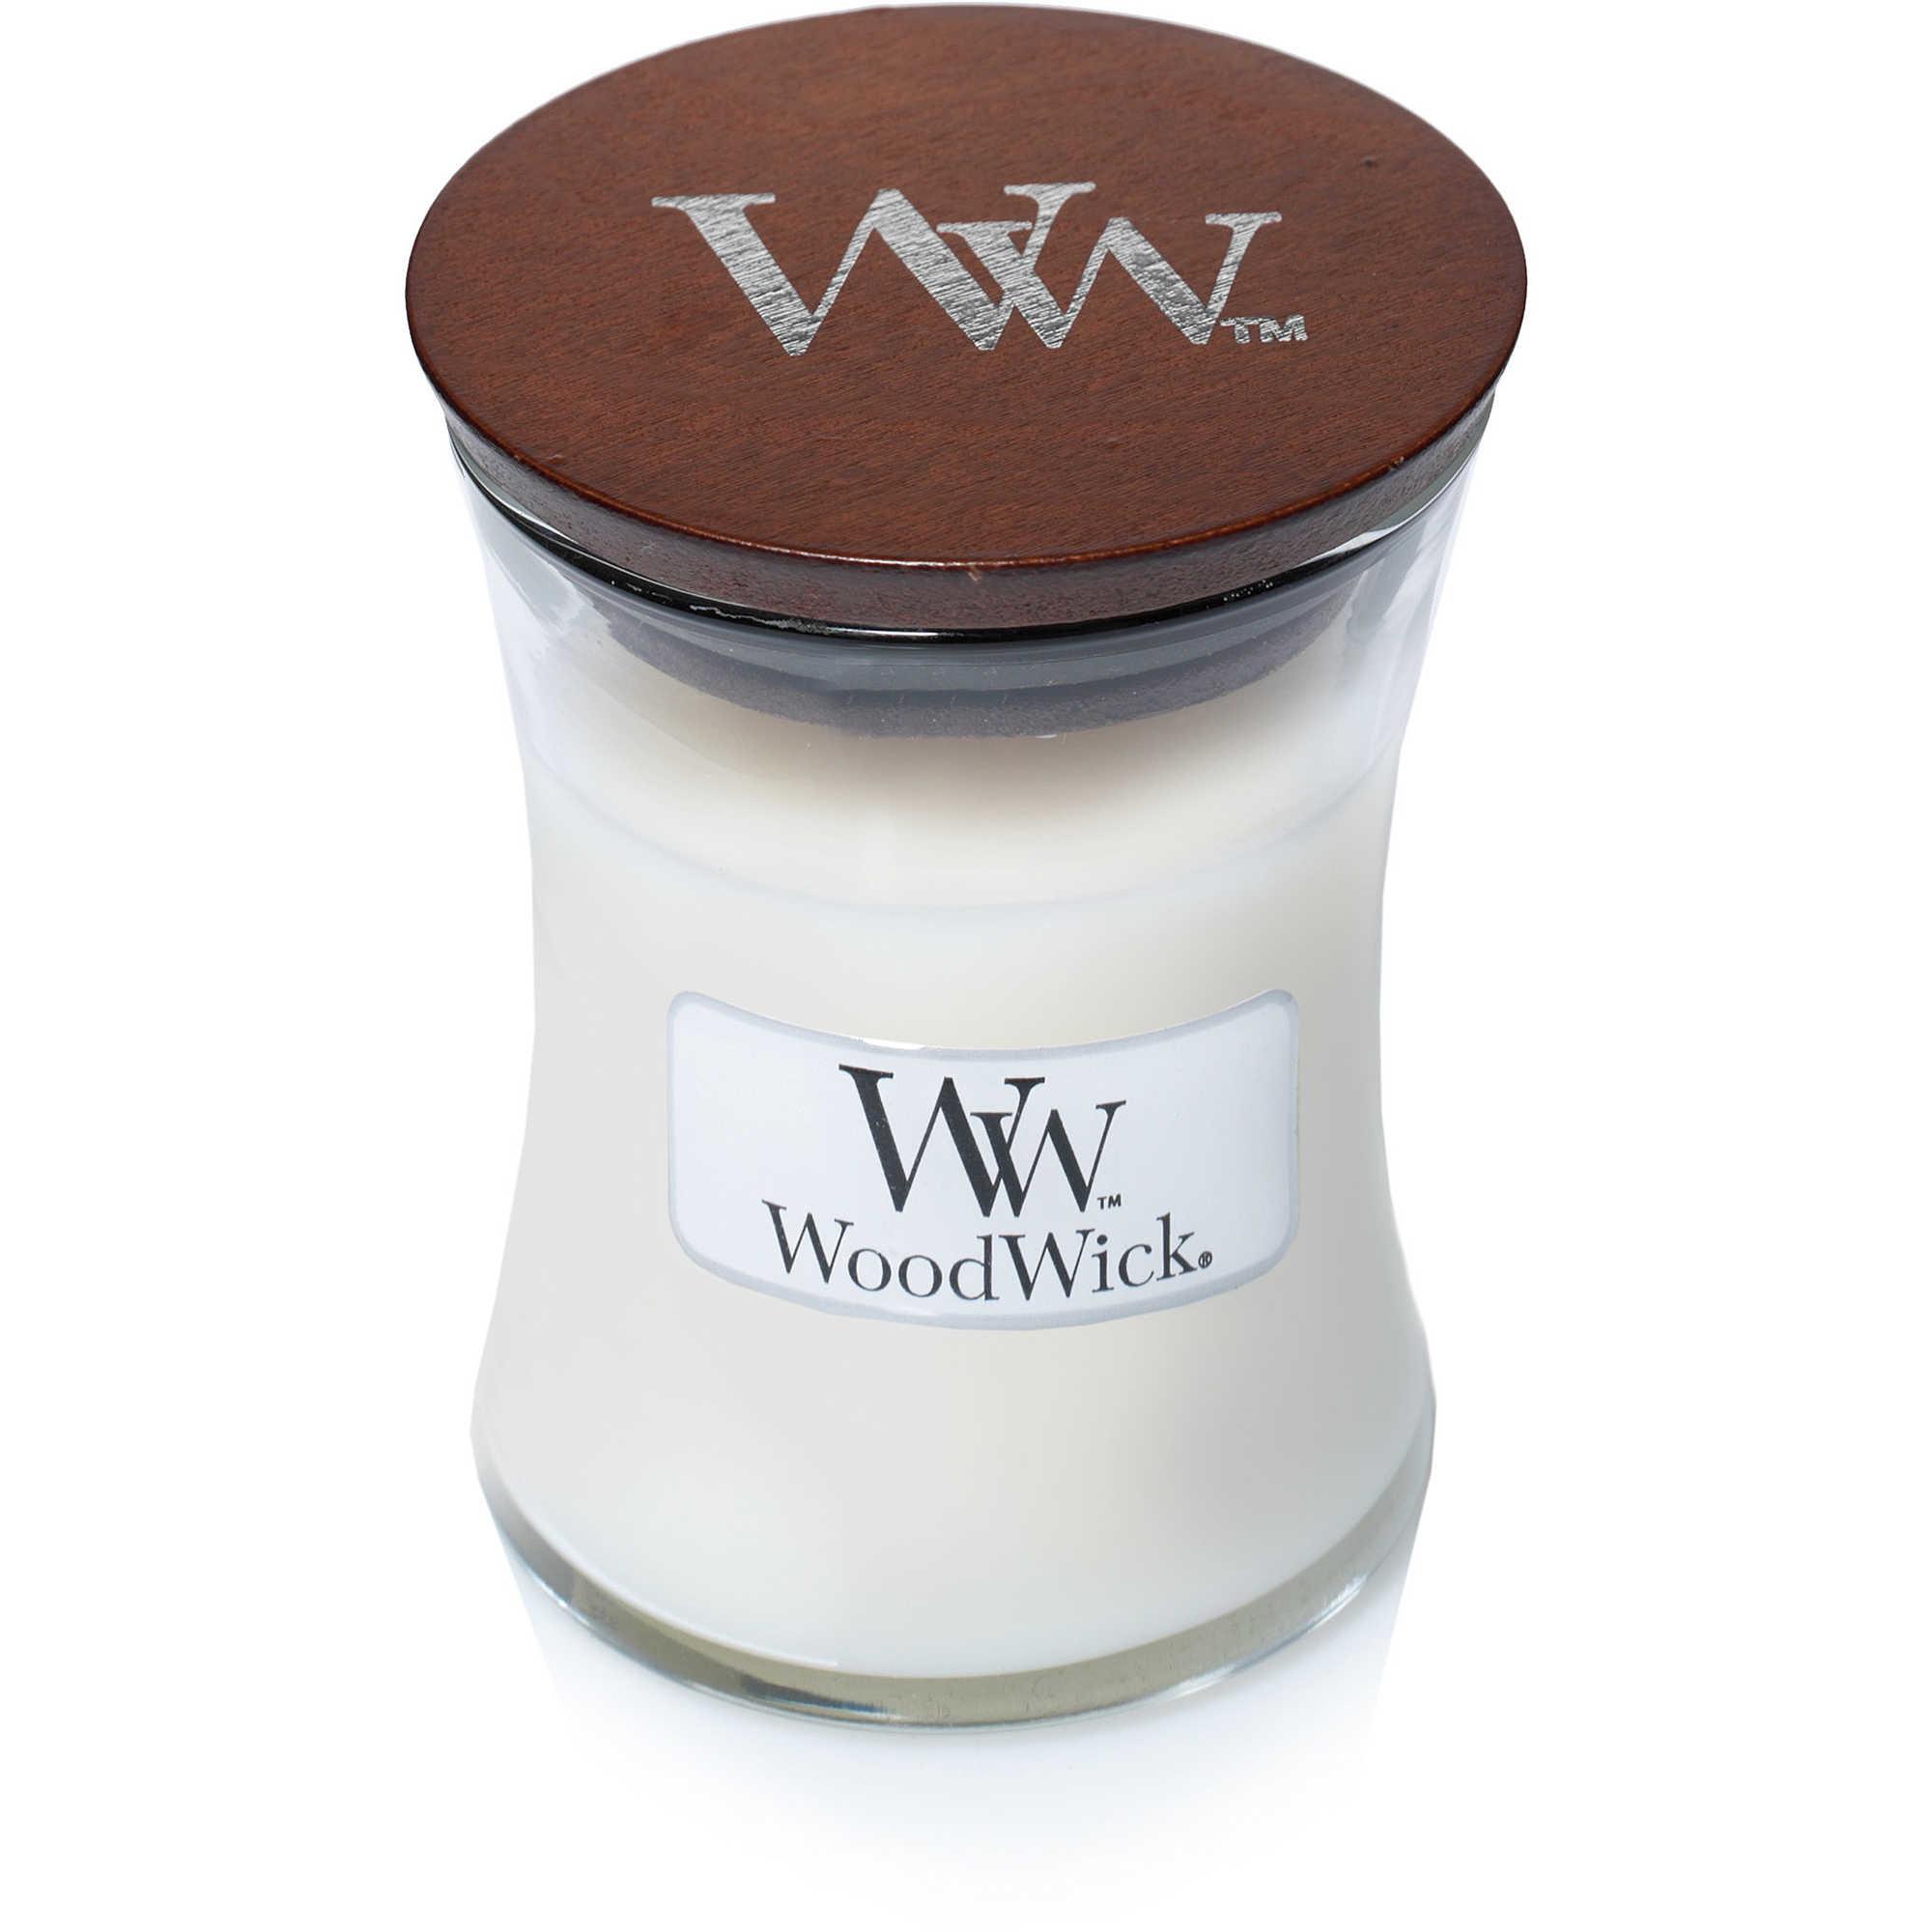 WOOD WICK bougie noix de coco petite-1